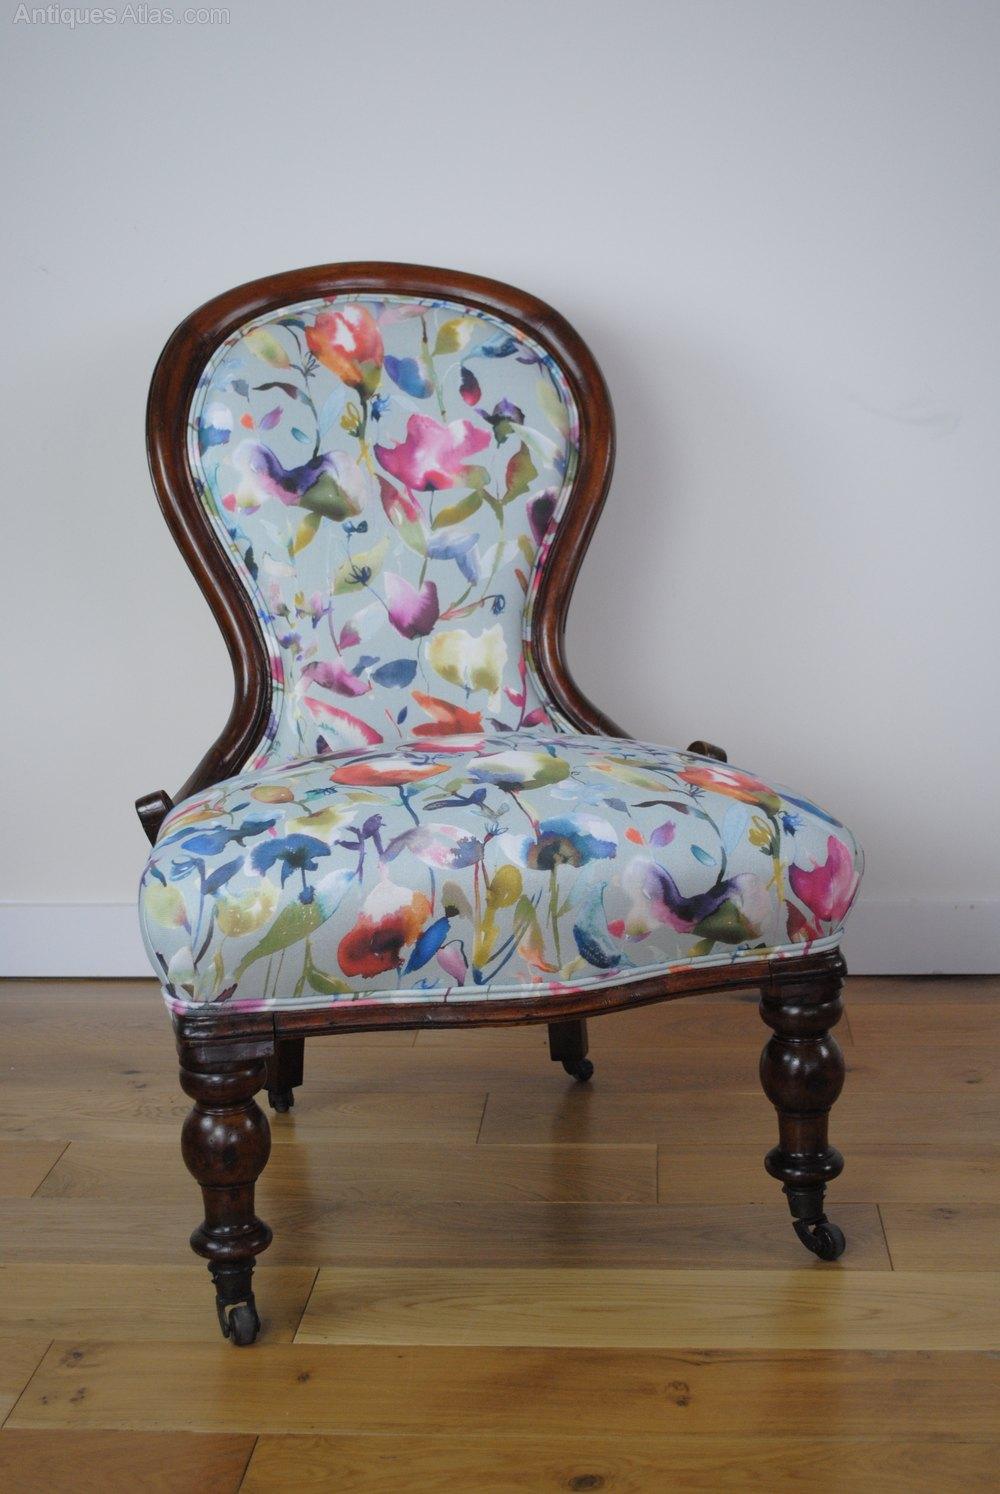 REDUCED - Victorian Nursing Chair Antique Nursing Chairs ... - REDUCED - Victorian Nursing Chair - Antiques Atlas